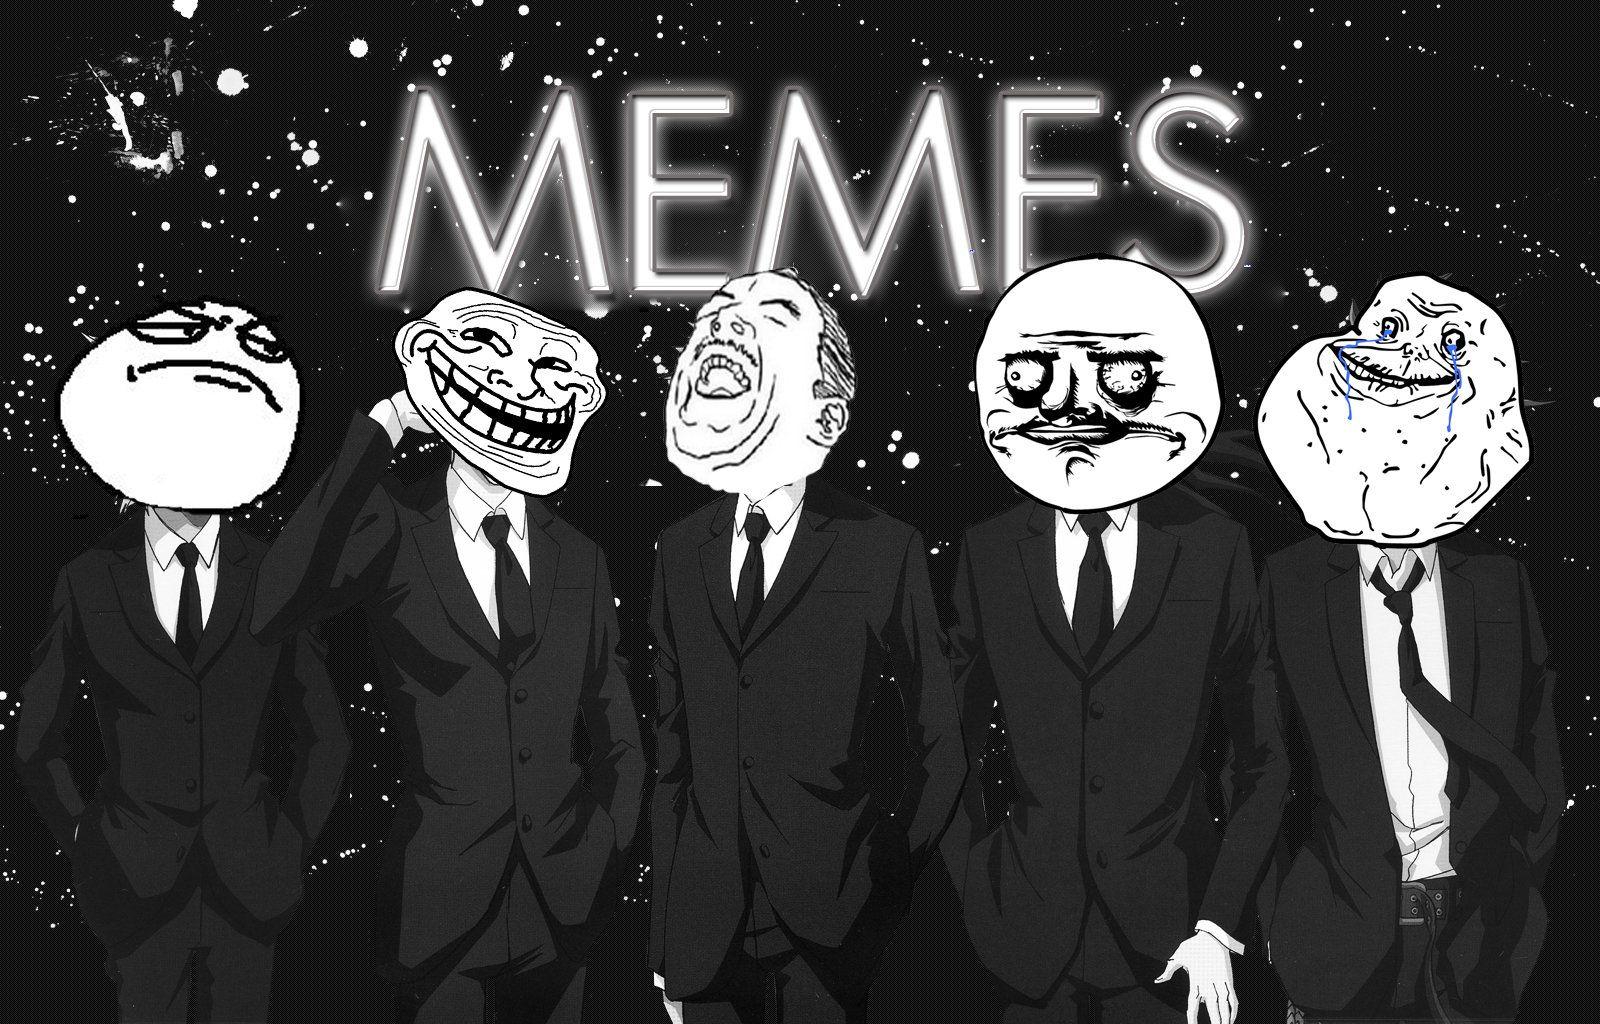 Meme Resorvoir Starring Eff Yeah Trollface Awwwwwww Yeahhhhh Me Gusta And Forever Alone Funny Memes Tumblr Funny Memes Memes